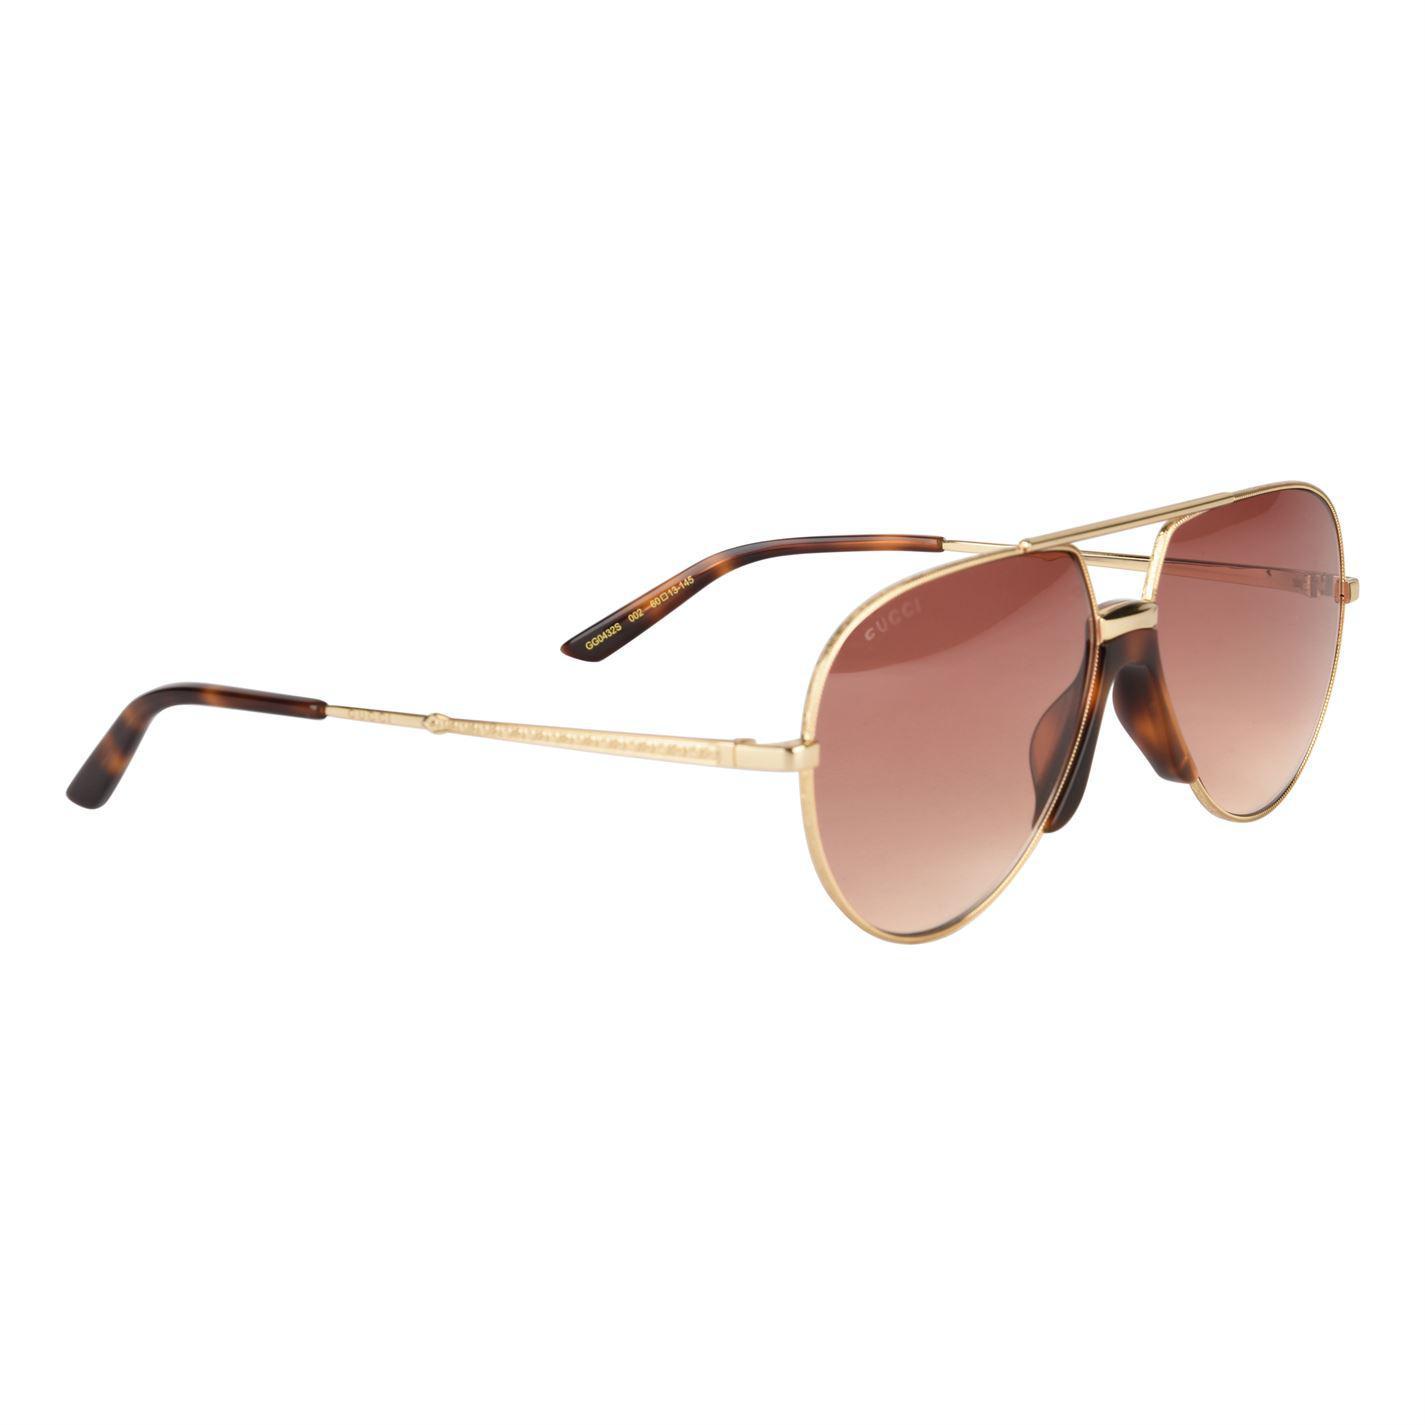 88877f03ba5 Lyst - Gucci Gg0432s Aviator Sunglasses in Brown